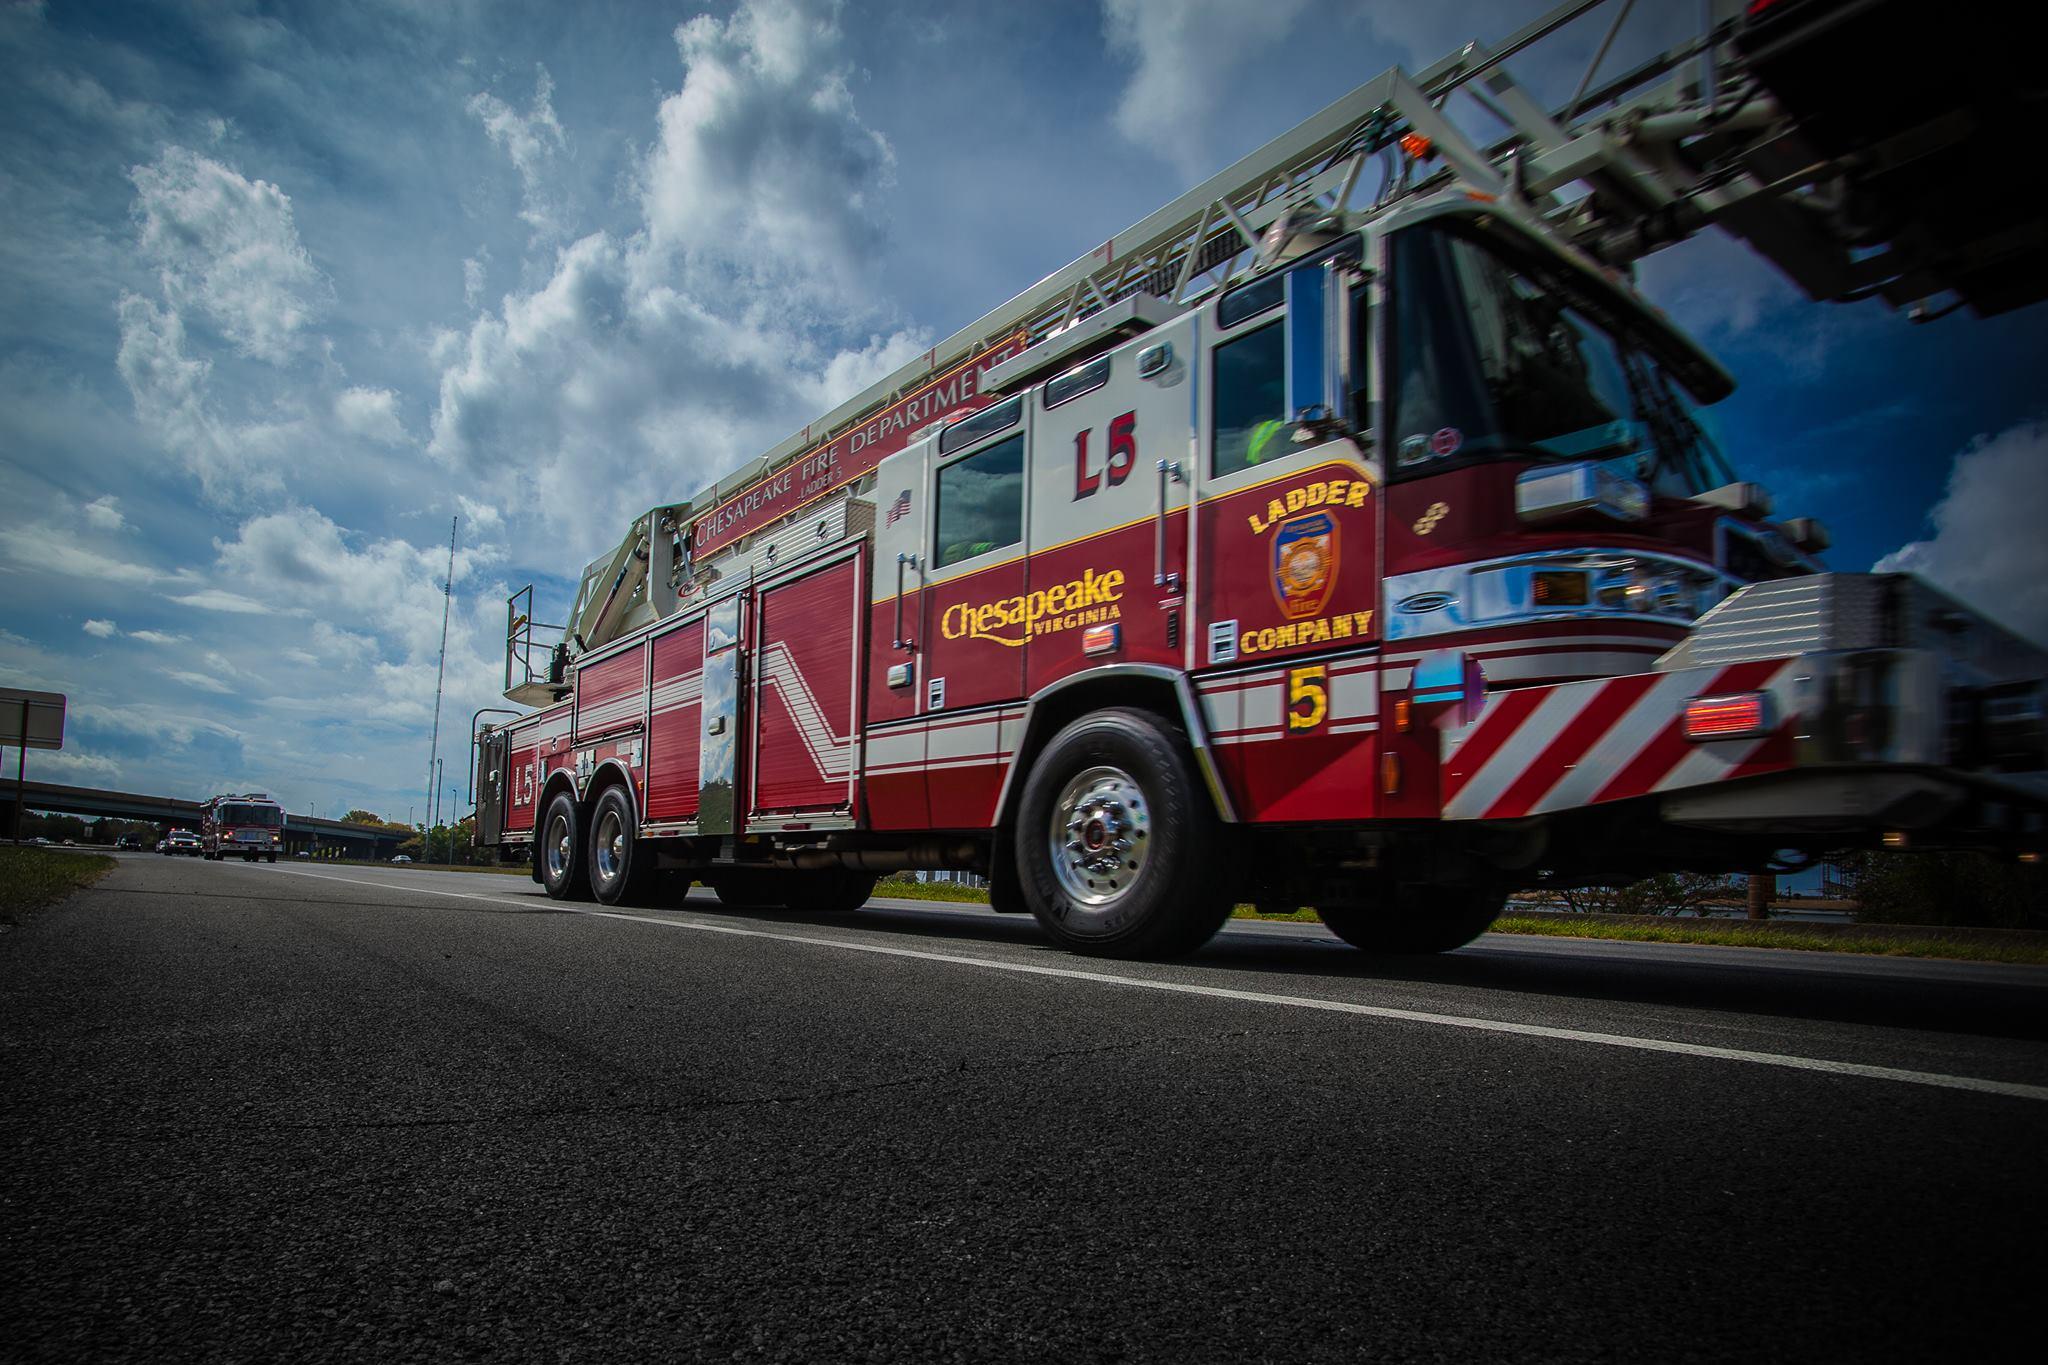 CHESAPEAKE FIRE DEPT_1522291893191.jpg.jpg